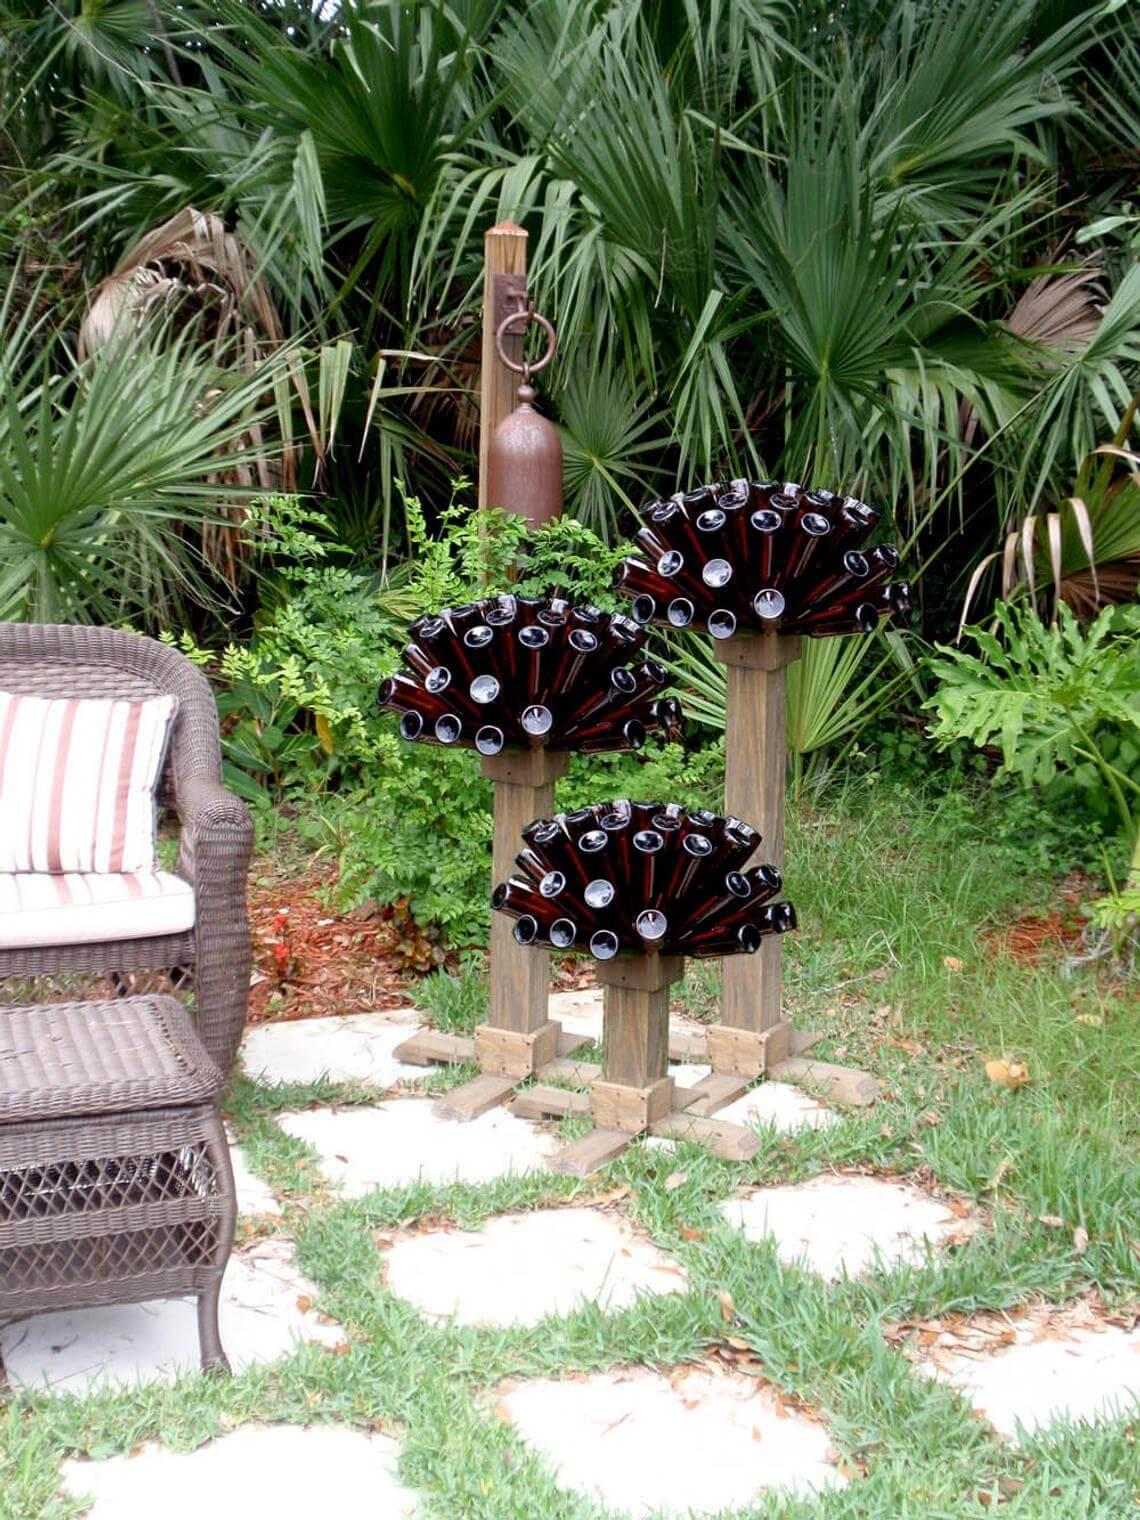 Towering Glass Bottle Decorative Garden Flowers